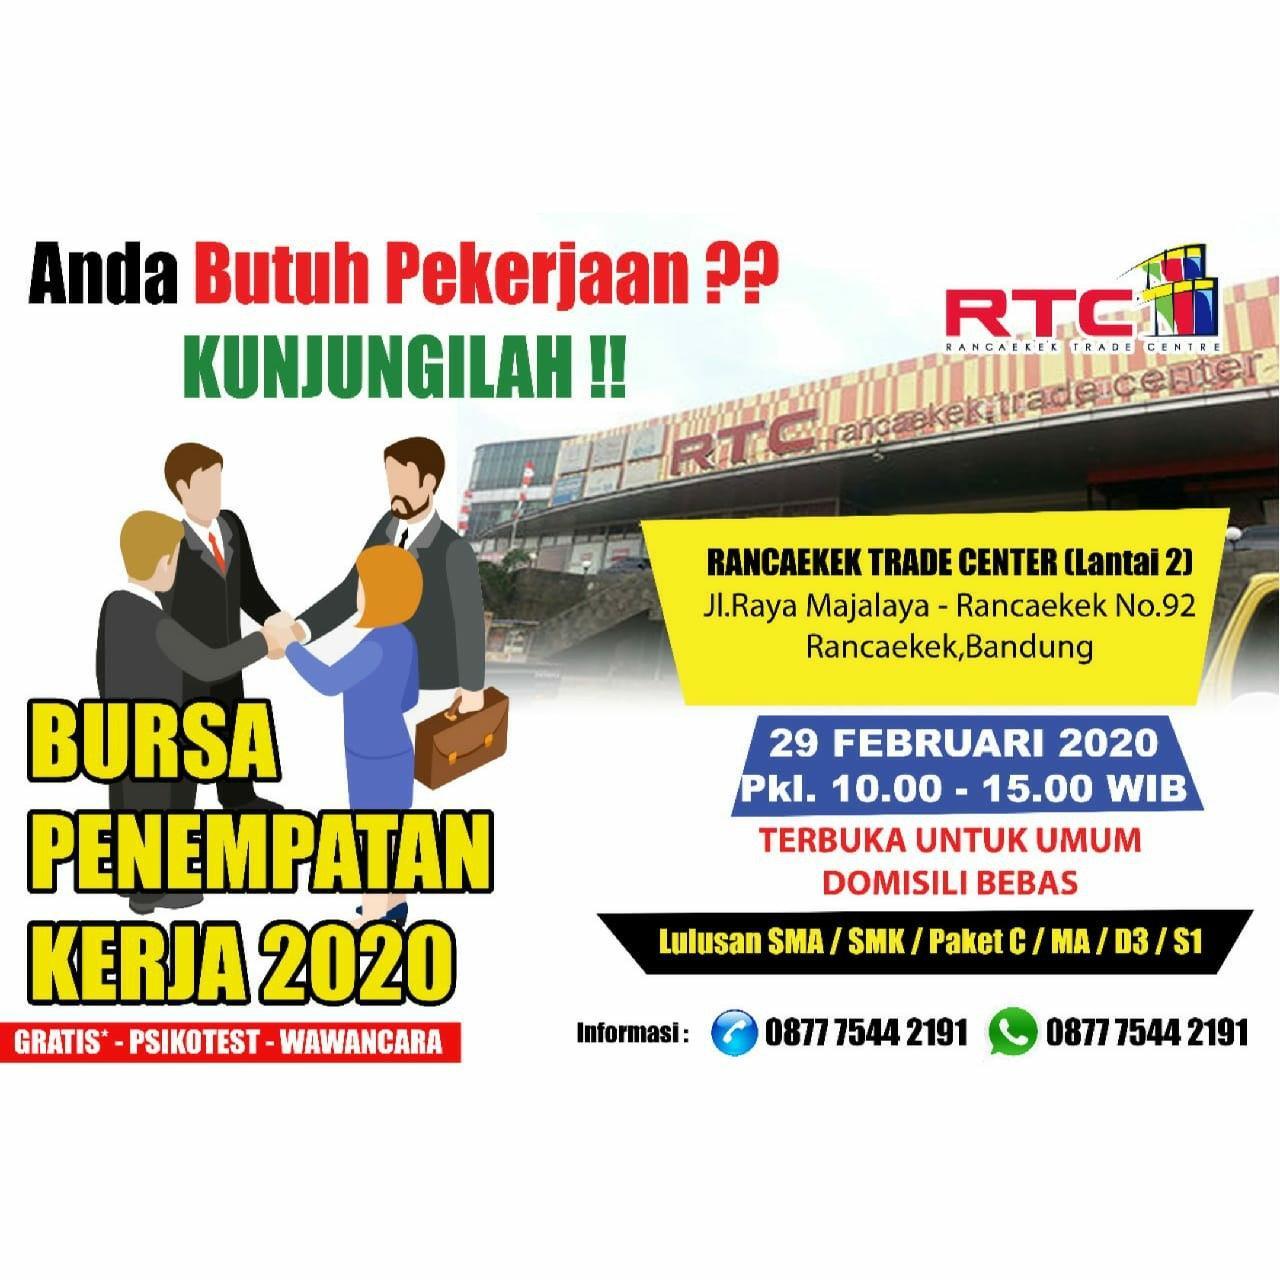 Bursa Penempatan Kerja Rancaekek Trade Center (RTC) Bandung Februari 2020